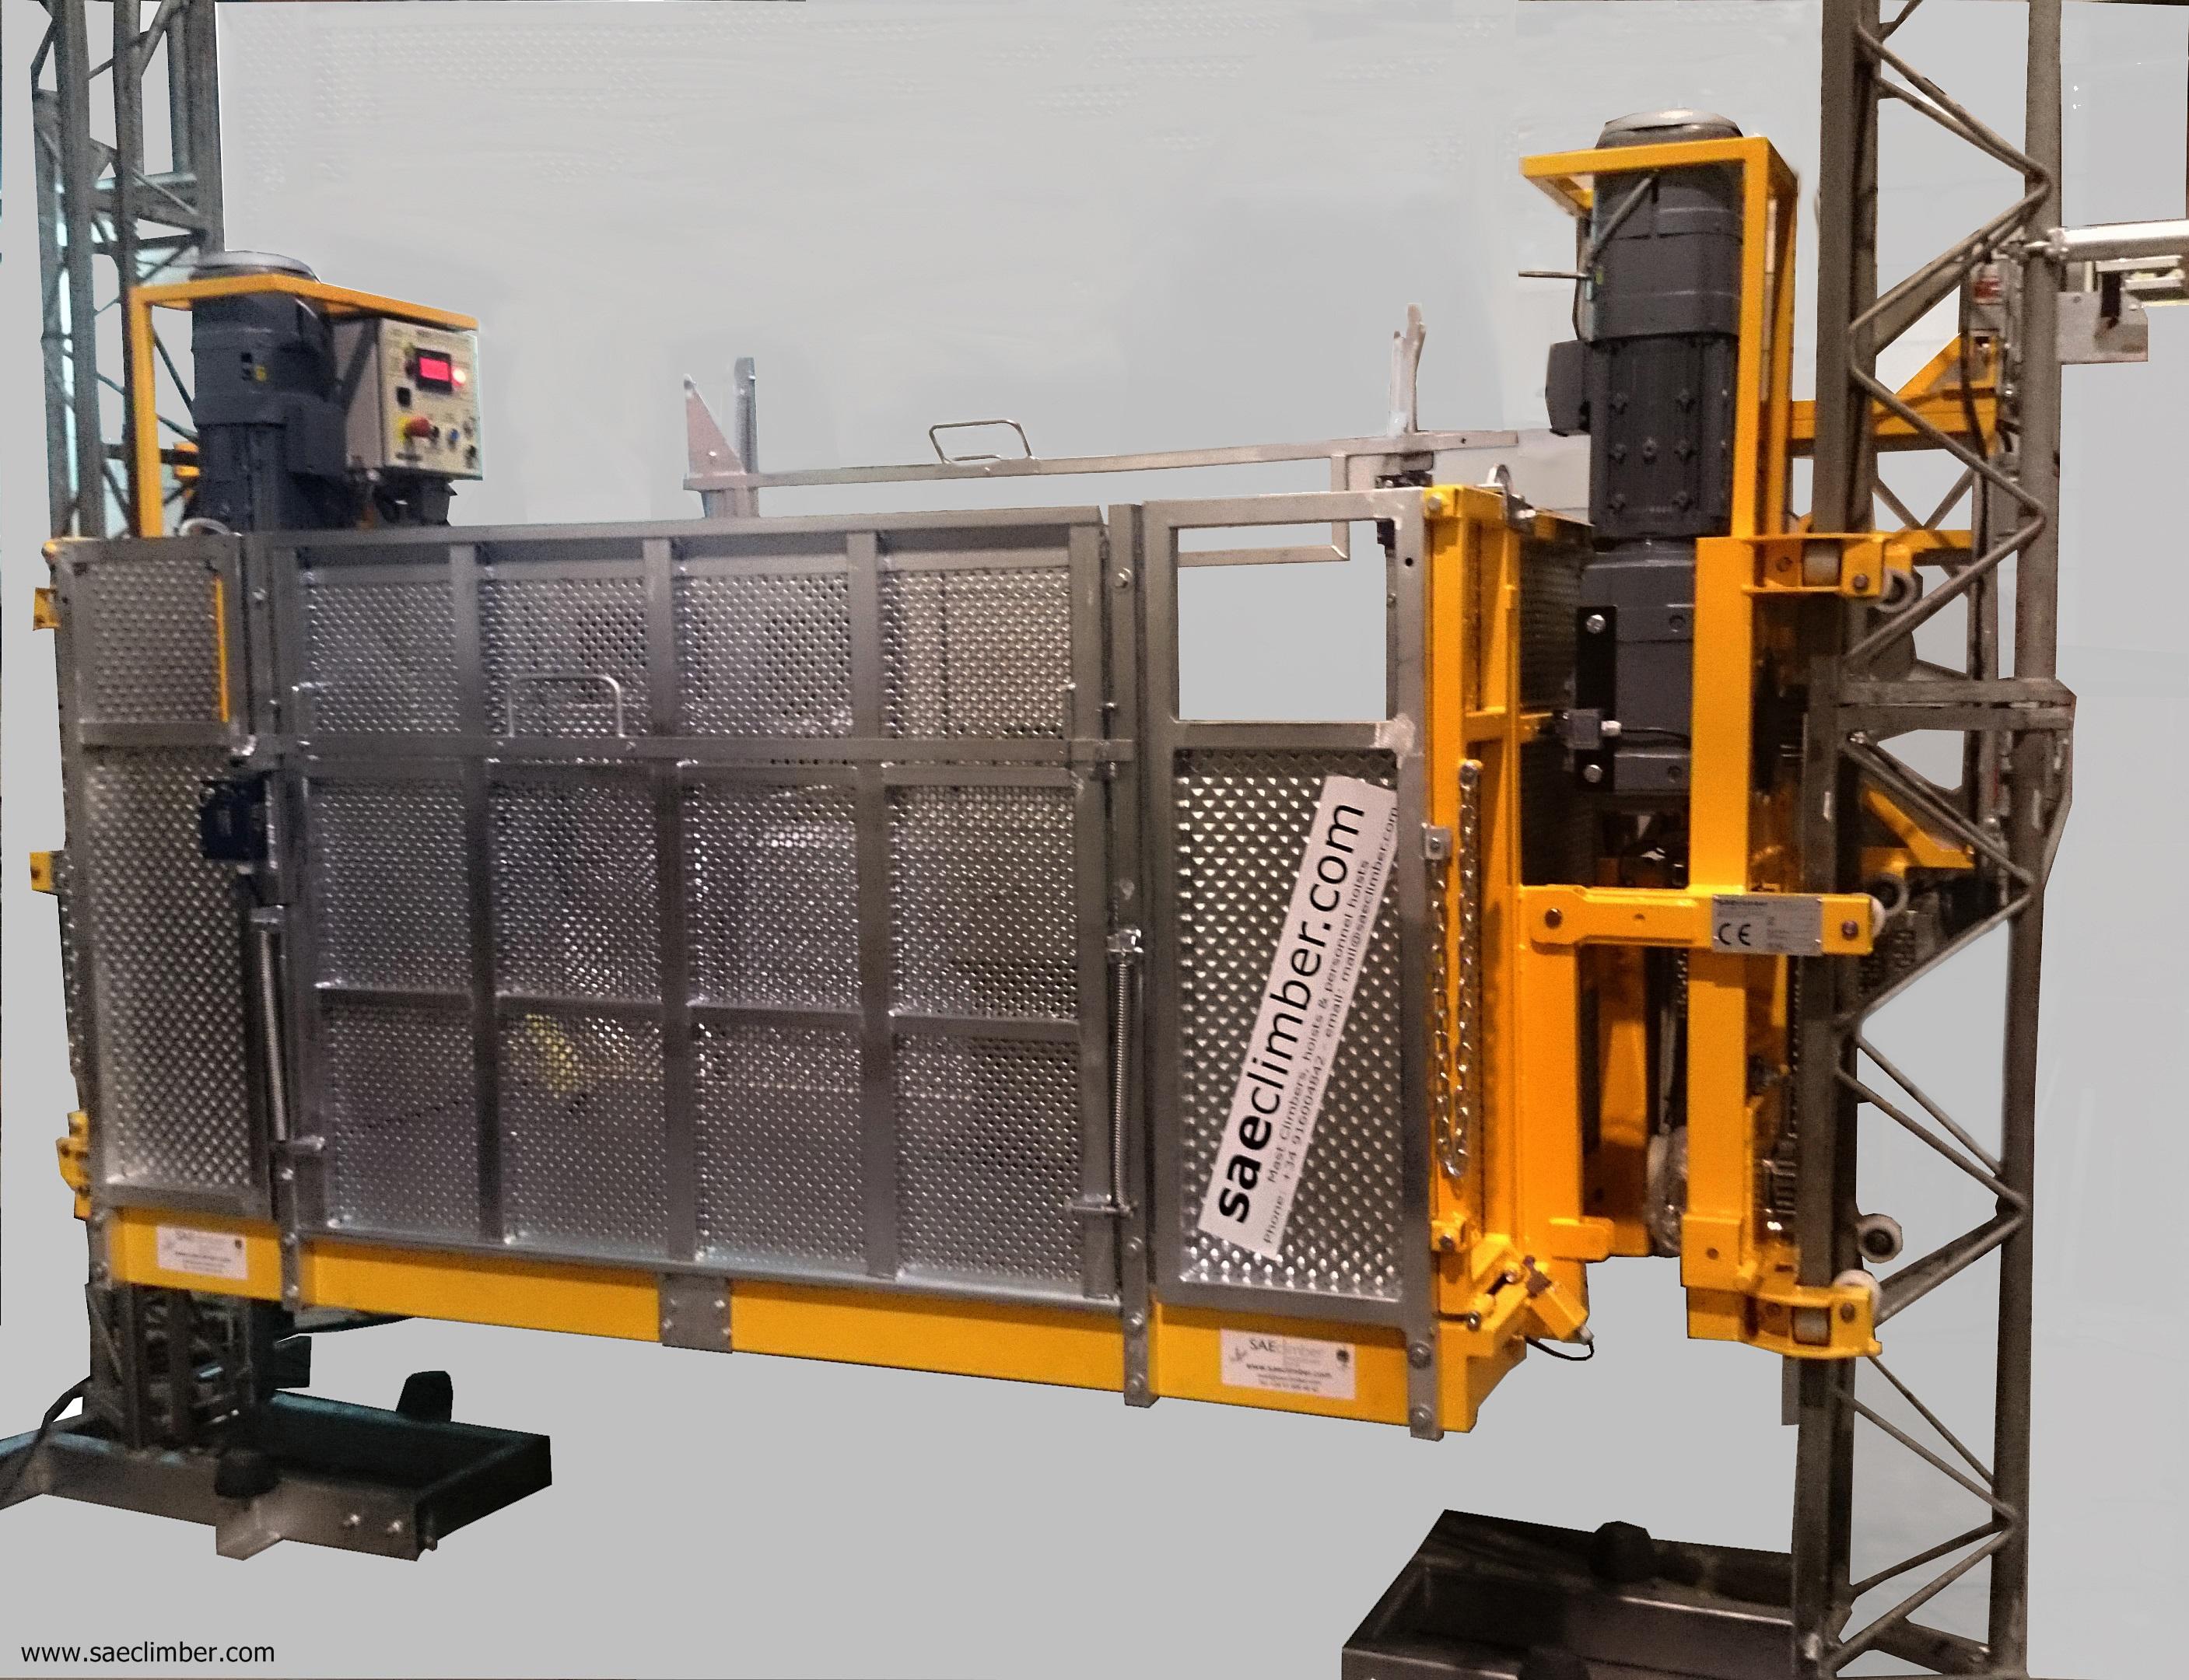 PH10- TIWN MAST- 2500 KG